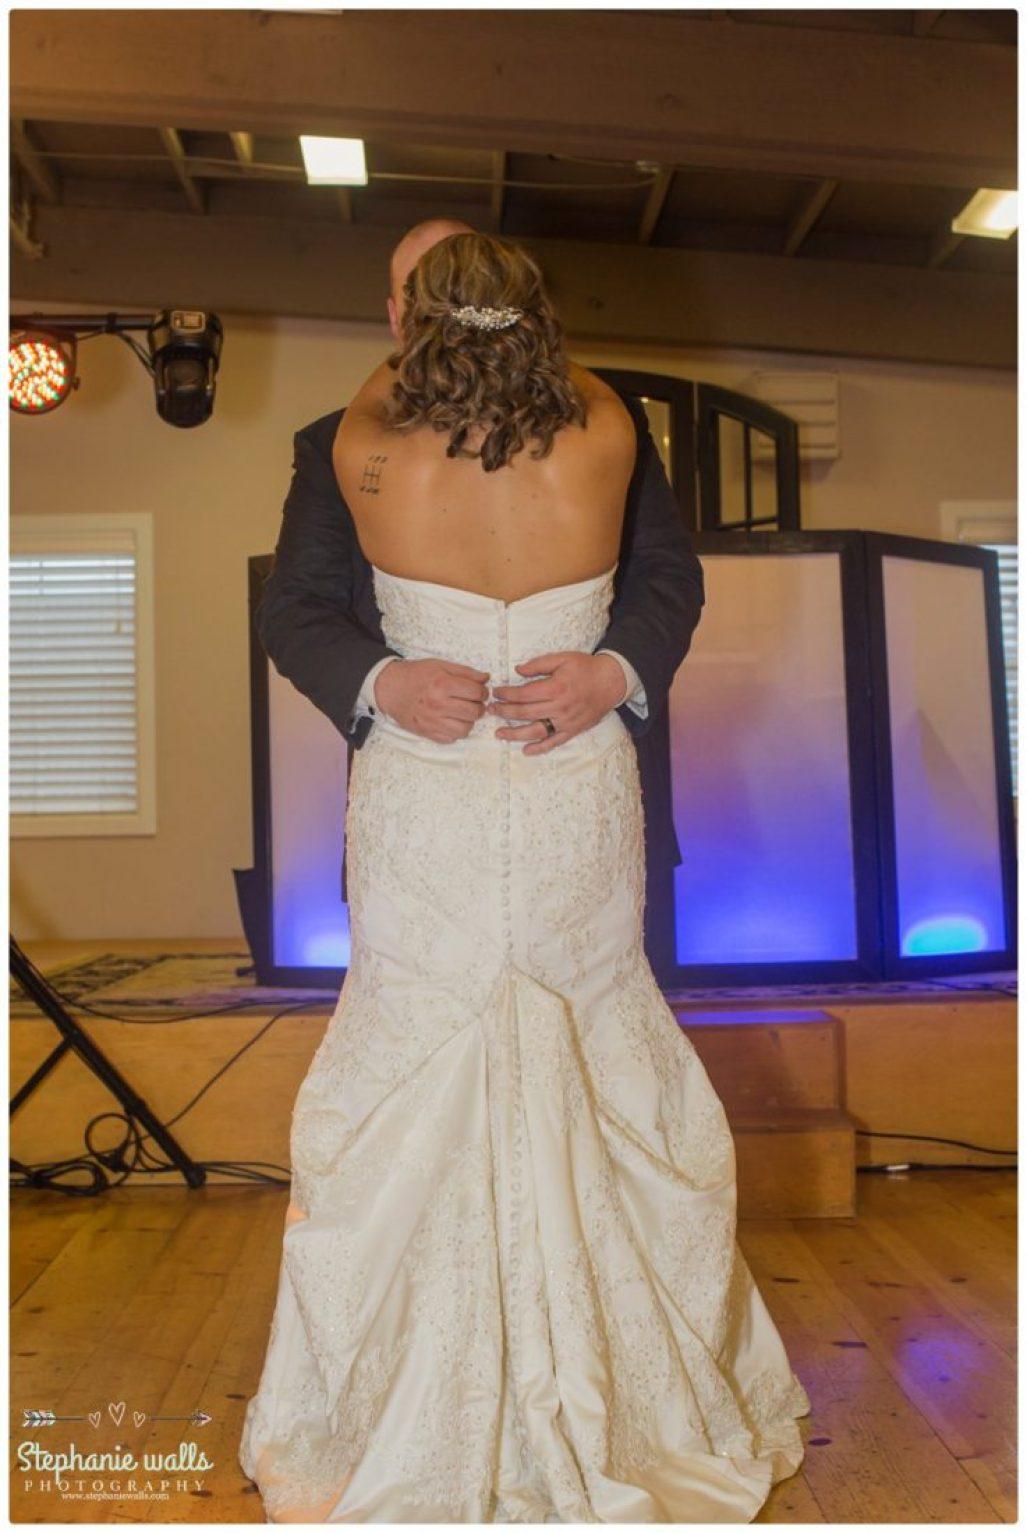 2016 03 24 0095 Racing Love   Snohomish Event Center   Snohomish Wedding Photographer